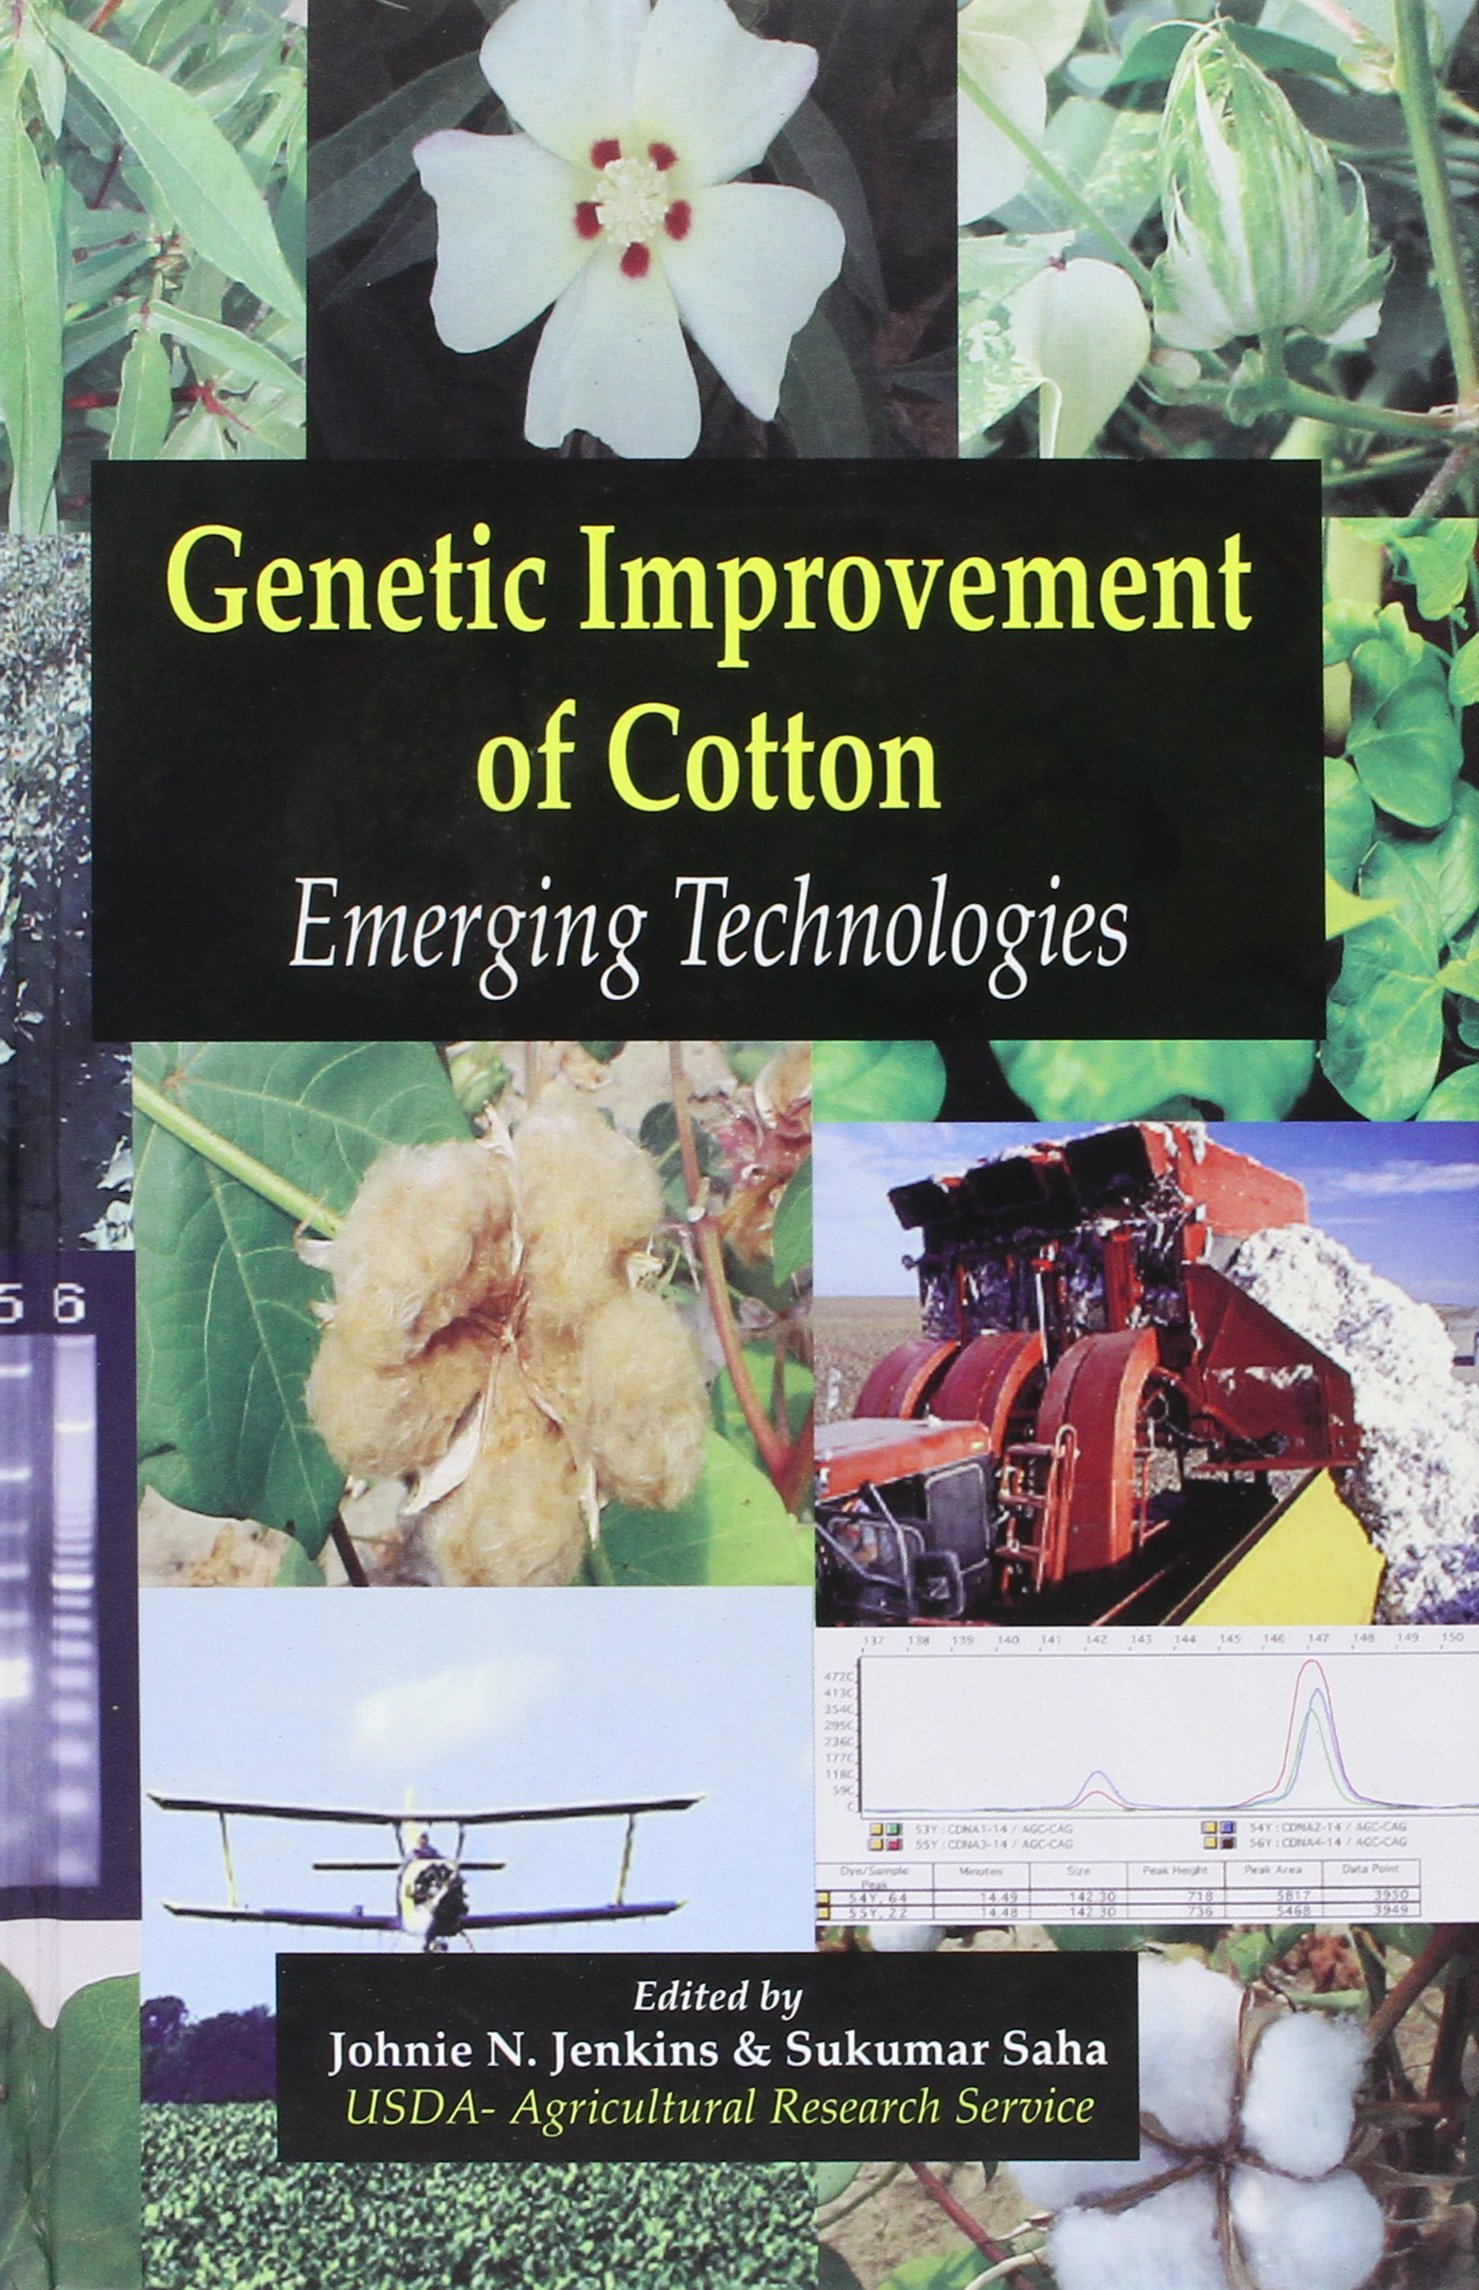 Genetic Improvement of Cotton: Emerging Technologies